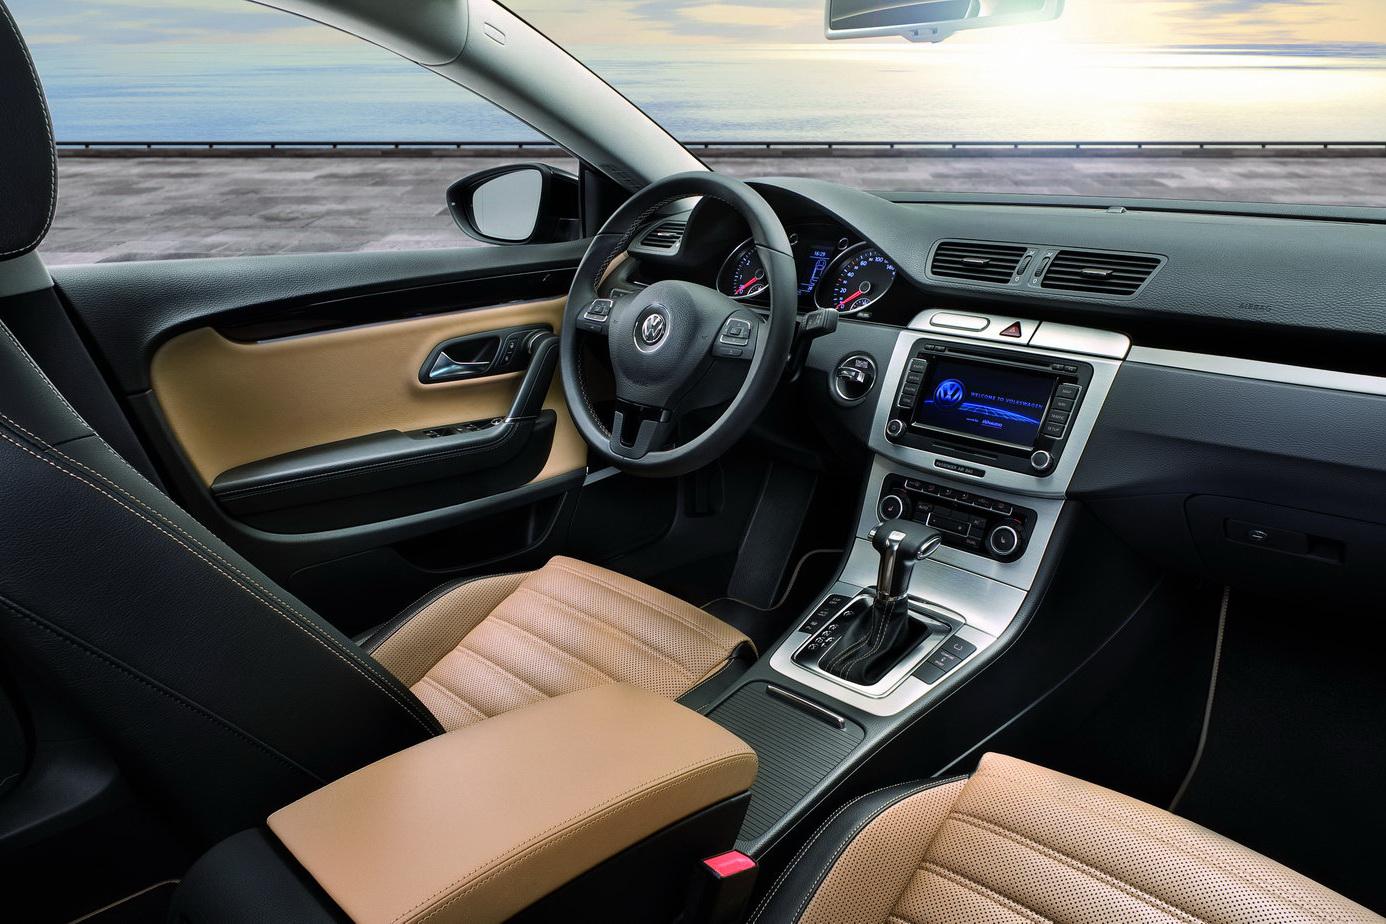 http://2.bp.blogspot.com/_FoXyvaPSnVk/TA6AsqmPm8I/AAAAAAAC7ss/MTKbwdXLQ8w/s1600/VW-Passat-Exclusive-4.jpg